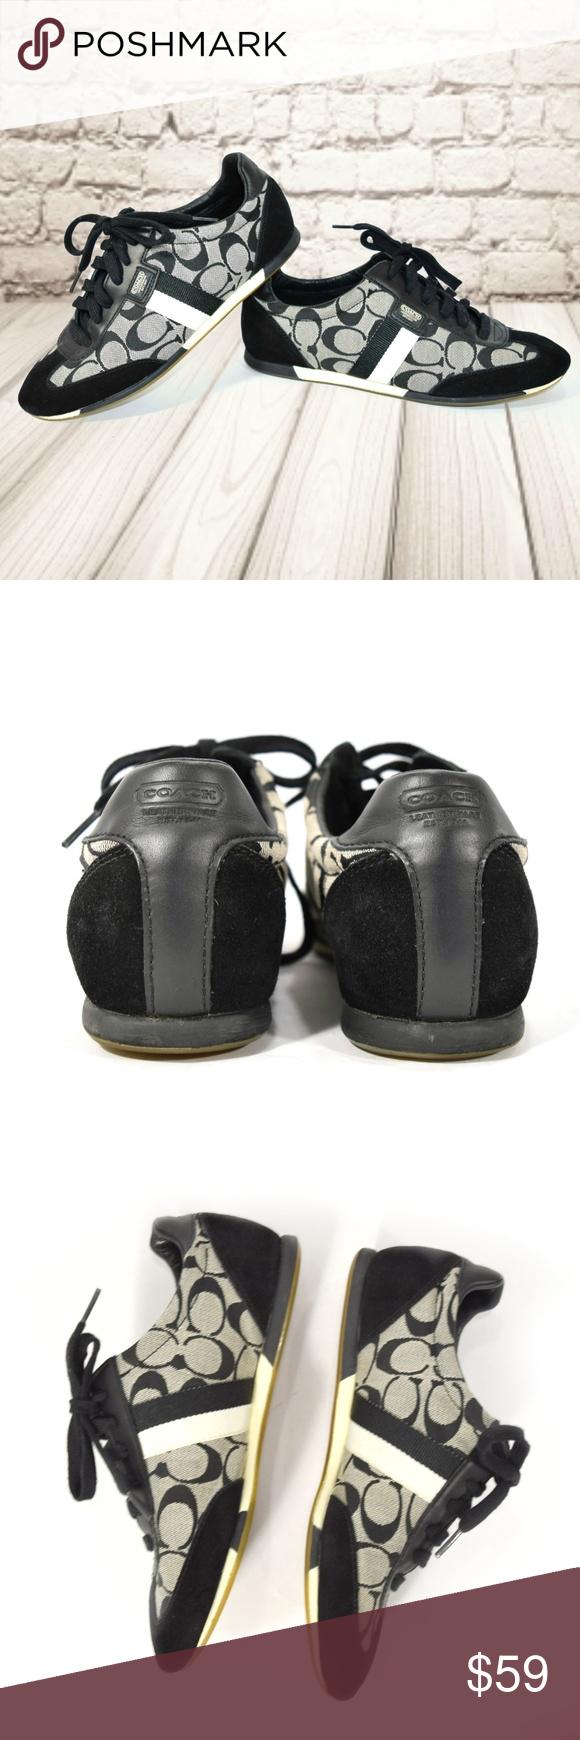 COACH Joss Black Suede Accent Logo Sneakers Black suede